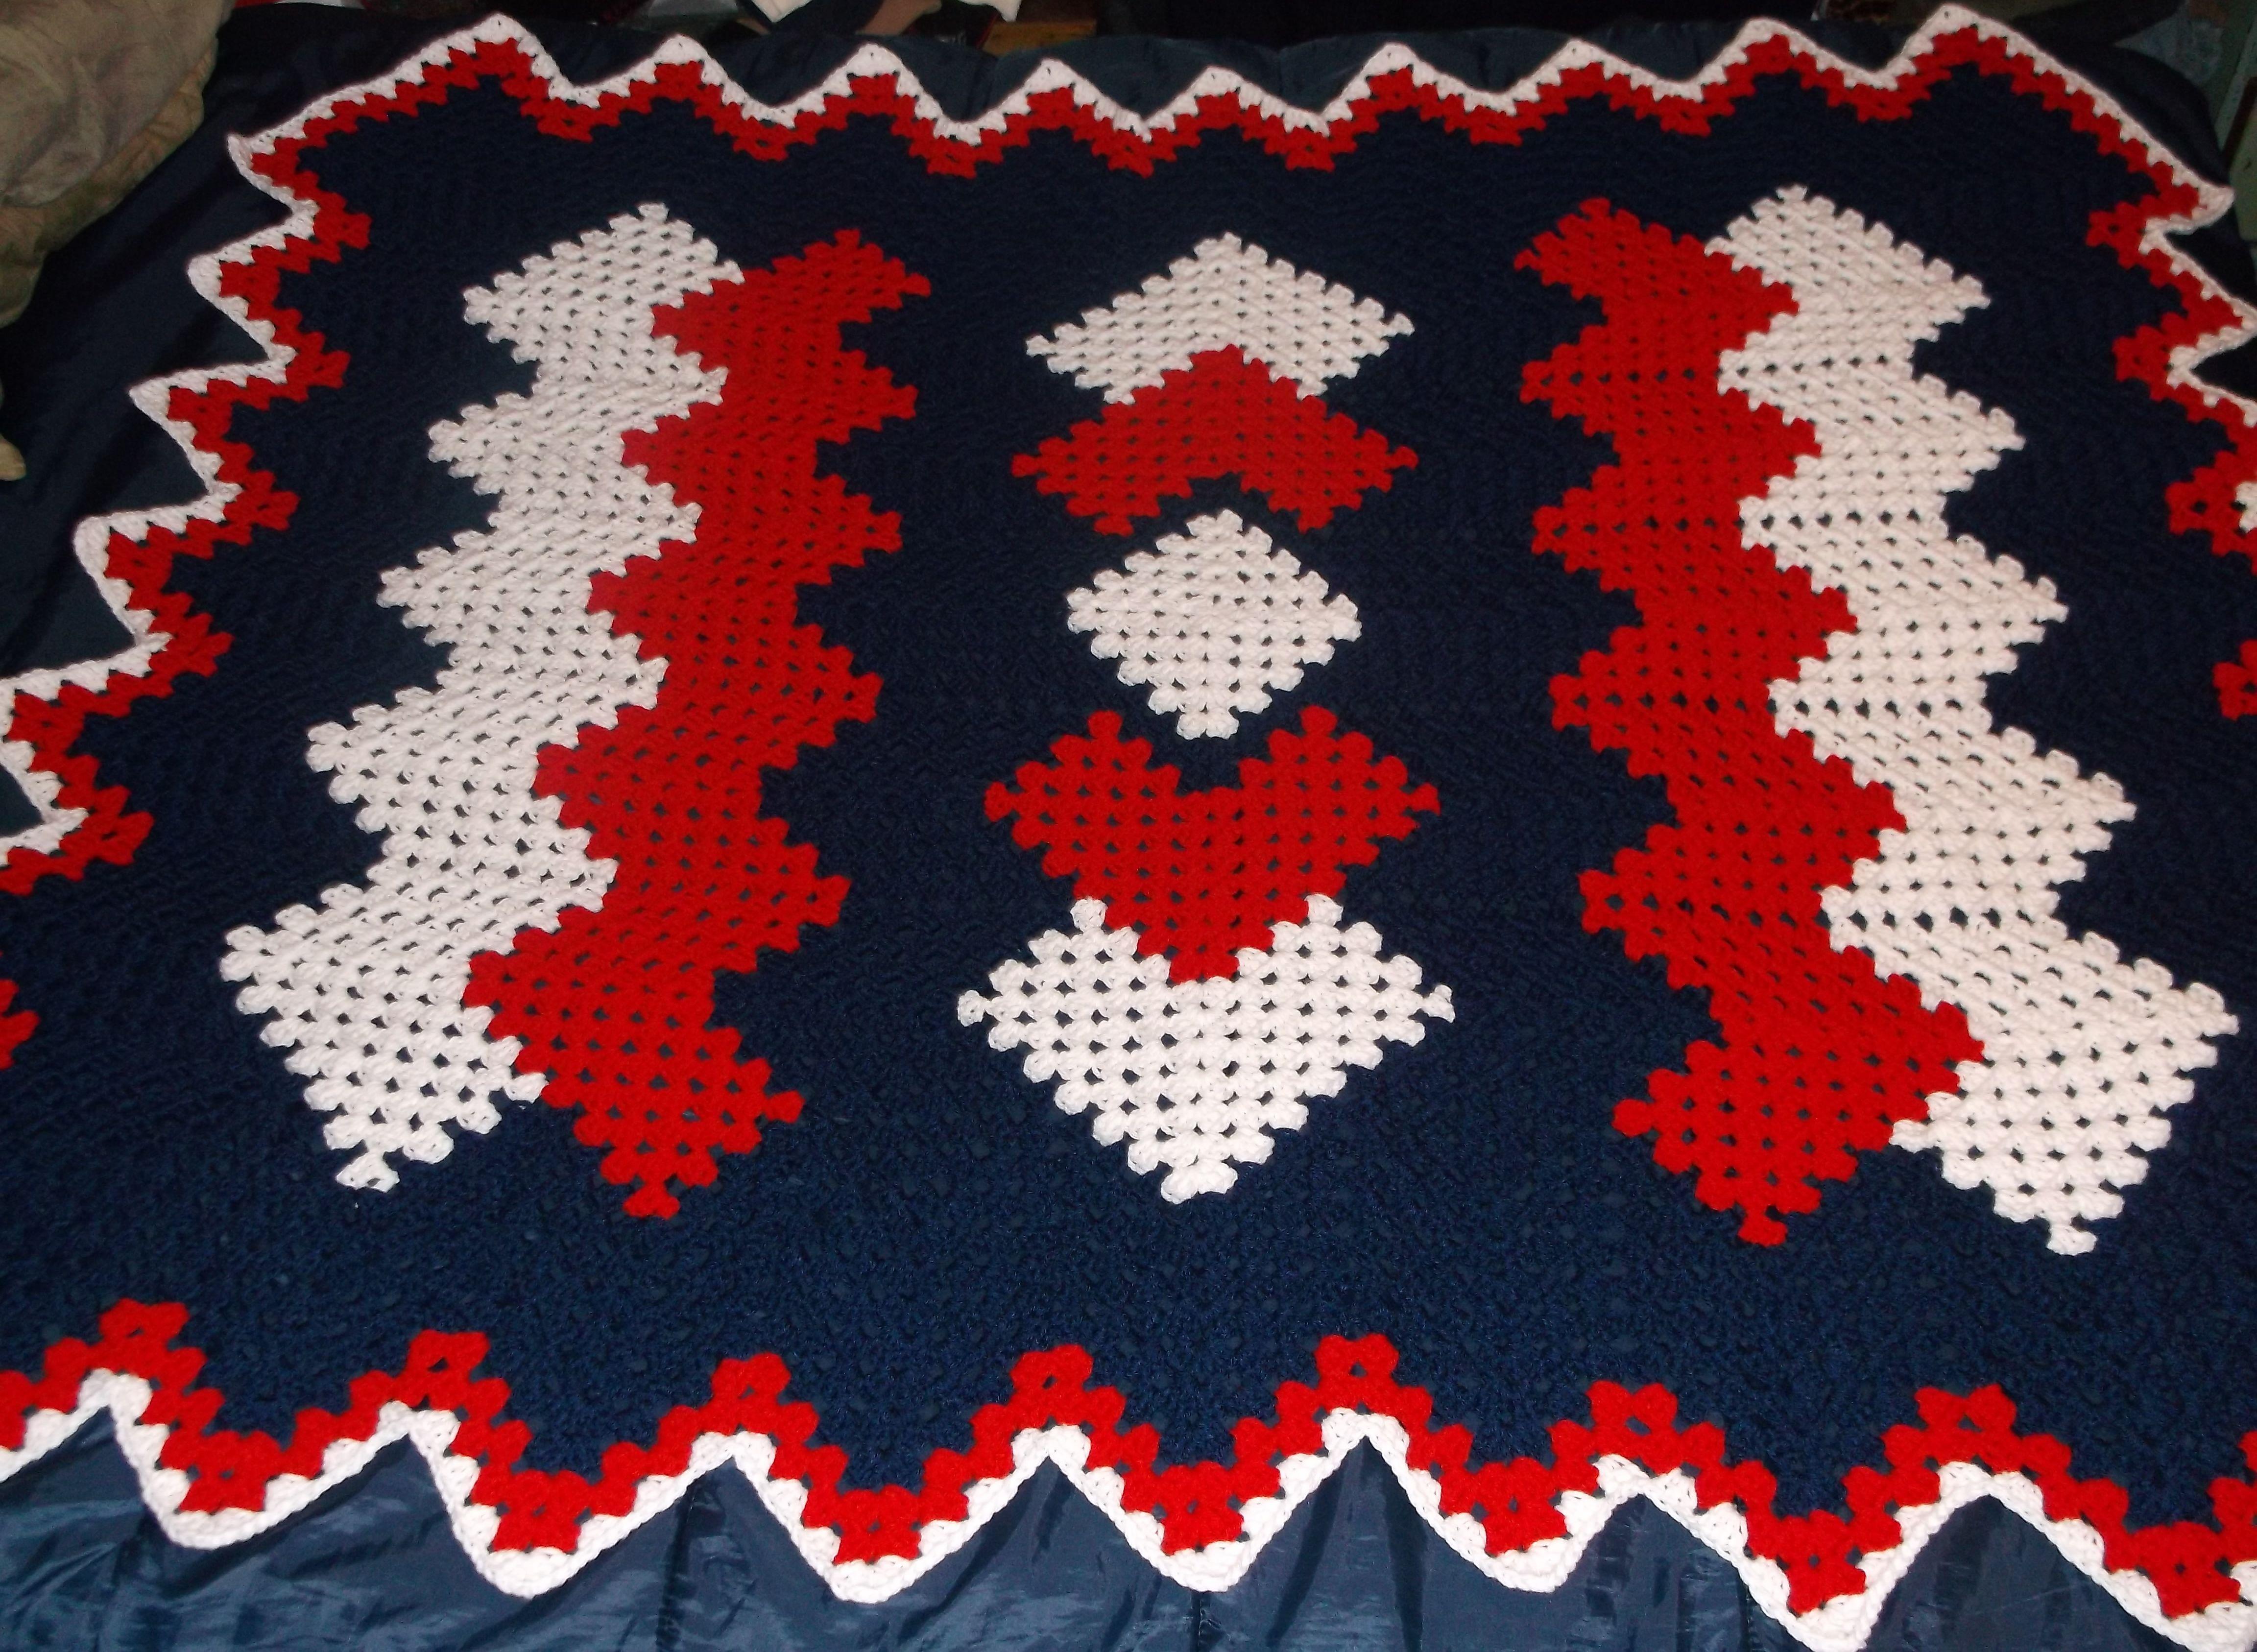 Drop in the Pond Crochet Afghan http://www.freewebs.com/bethintx/dropinthepondlaprobe.htm